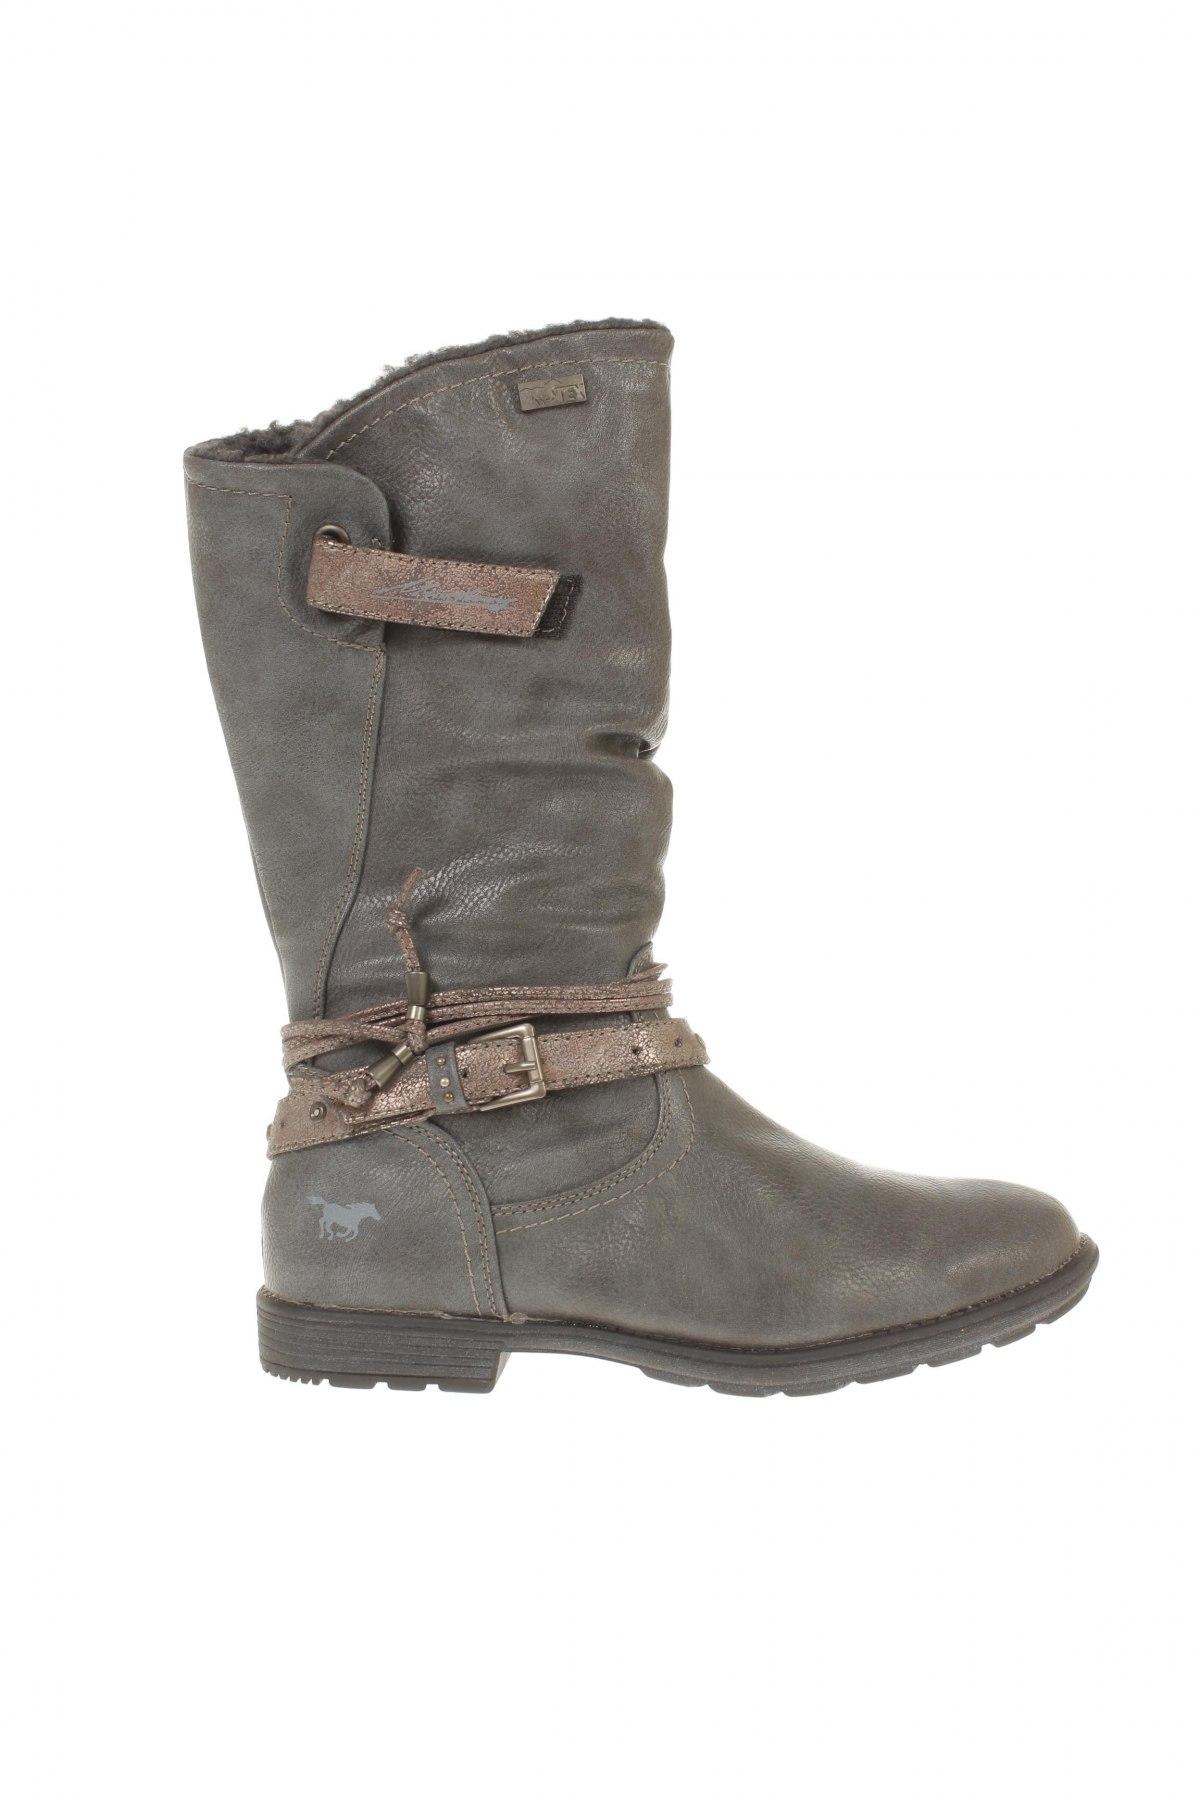 99e106e0c9 Γυναικείες μπότες Mustang - σε συμφέρουσα τιμή στο Remix -  102479223